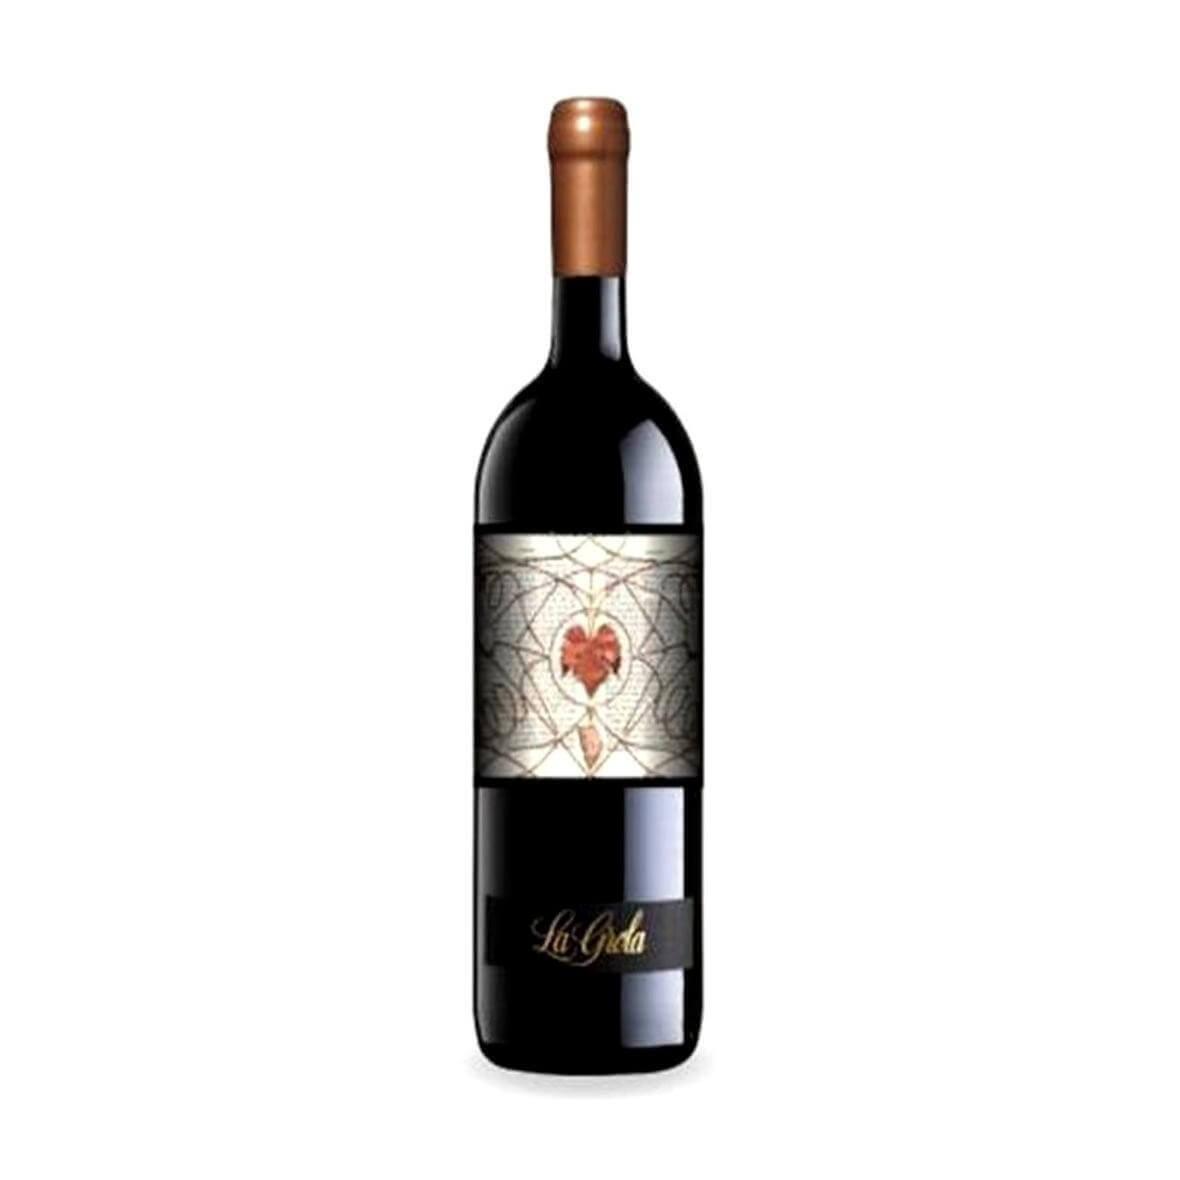 La Grola Limited Edition L.Ulian IGT Allegrini